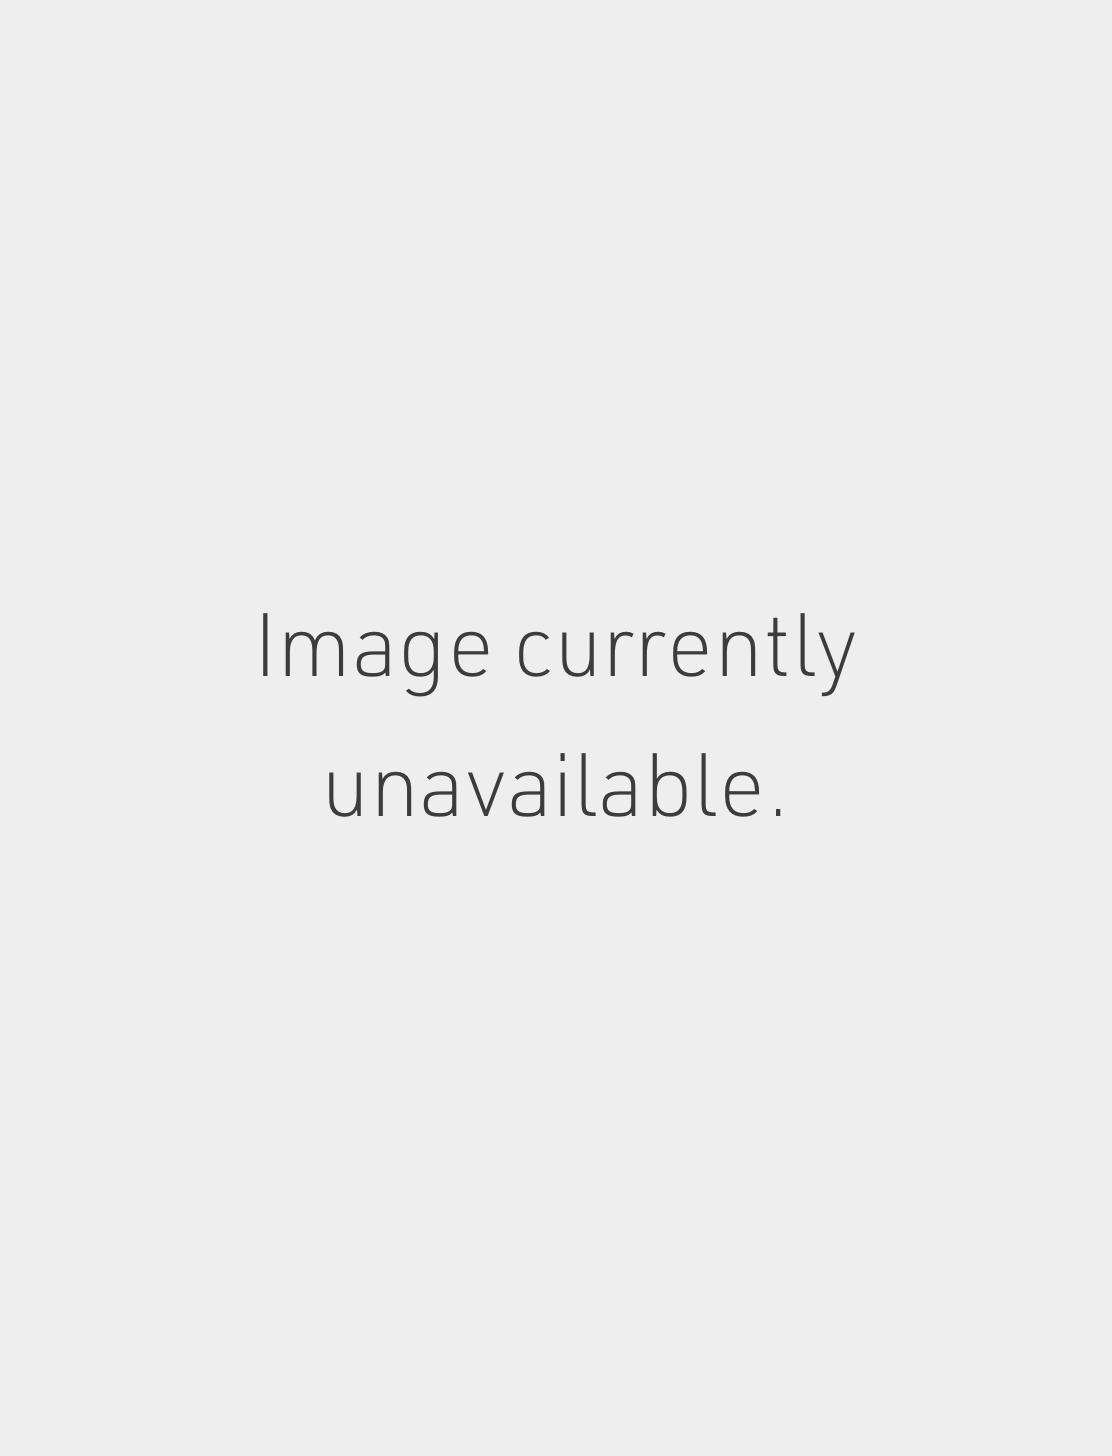 2mm Opal Thin Braid Threaded Stud (Helix) - WHITE GOLD Image #1